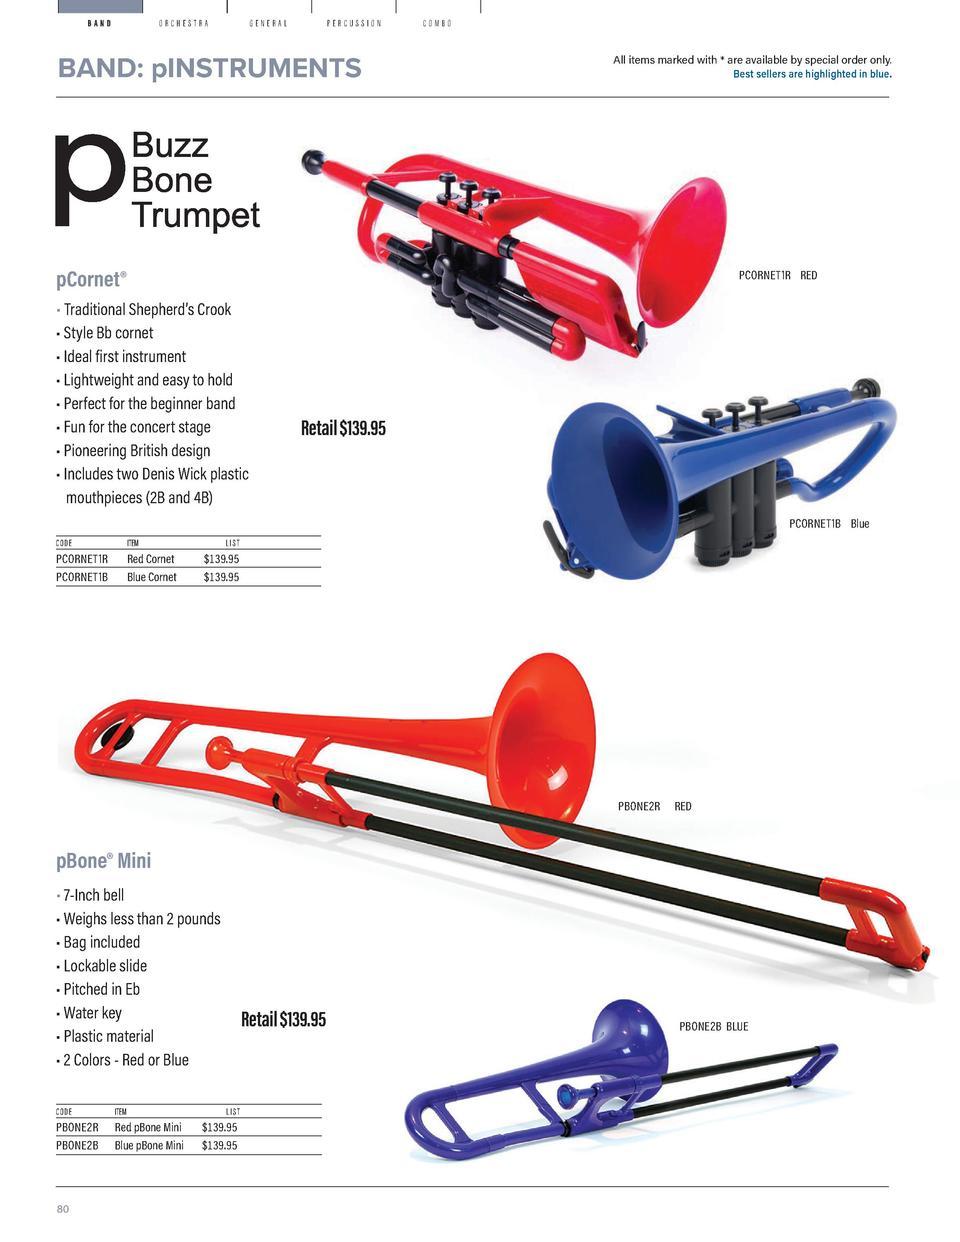 4 Inch Locking White Plastic Peg Hooks Fit 1//8-1//4 Pegboard 12 Keys 250 PACK